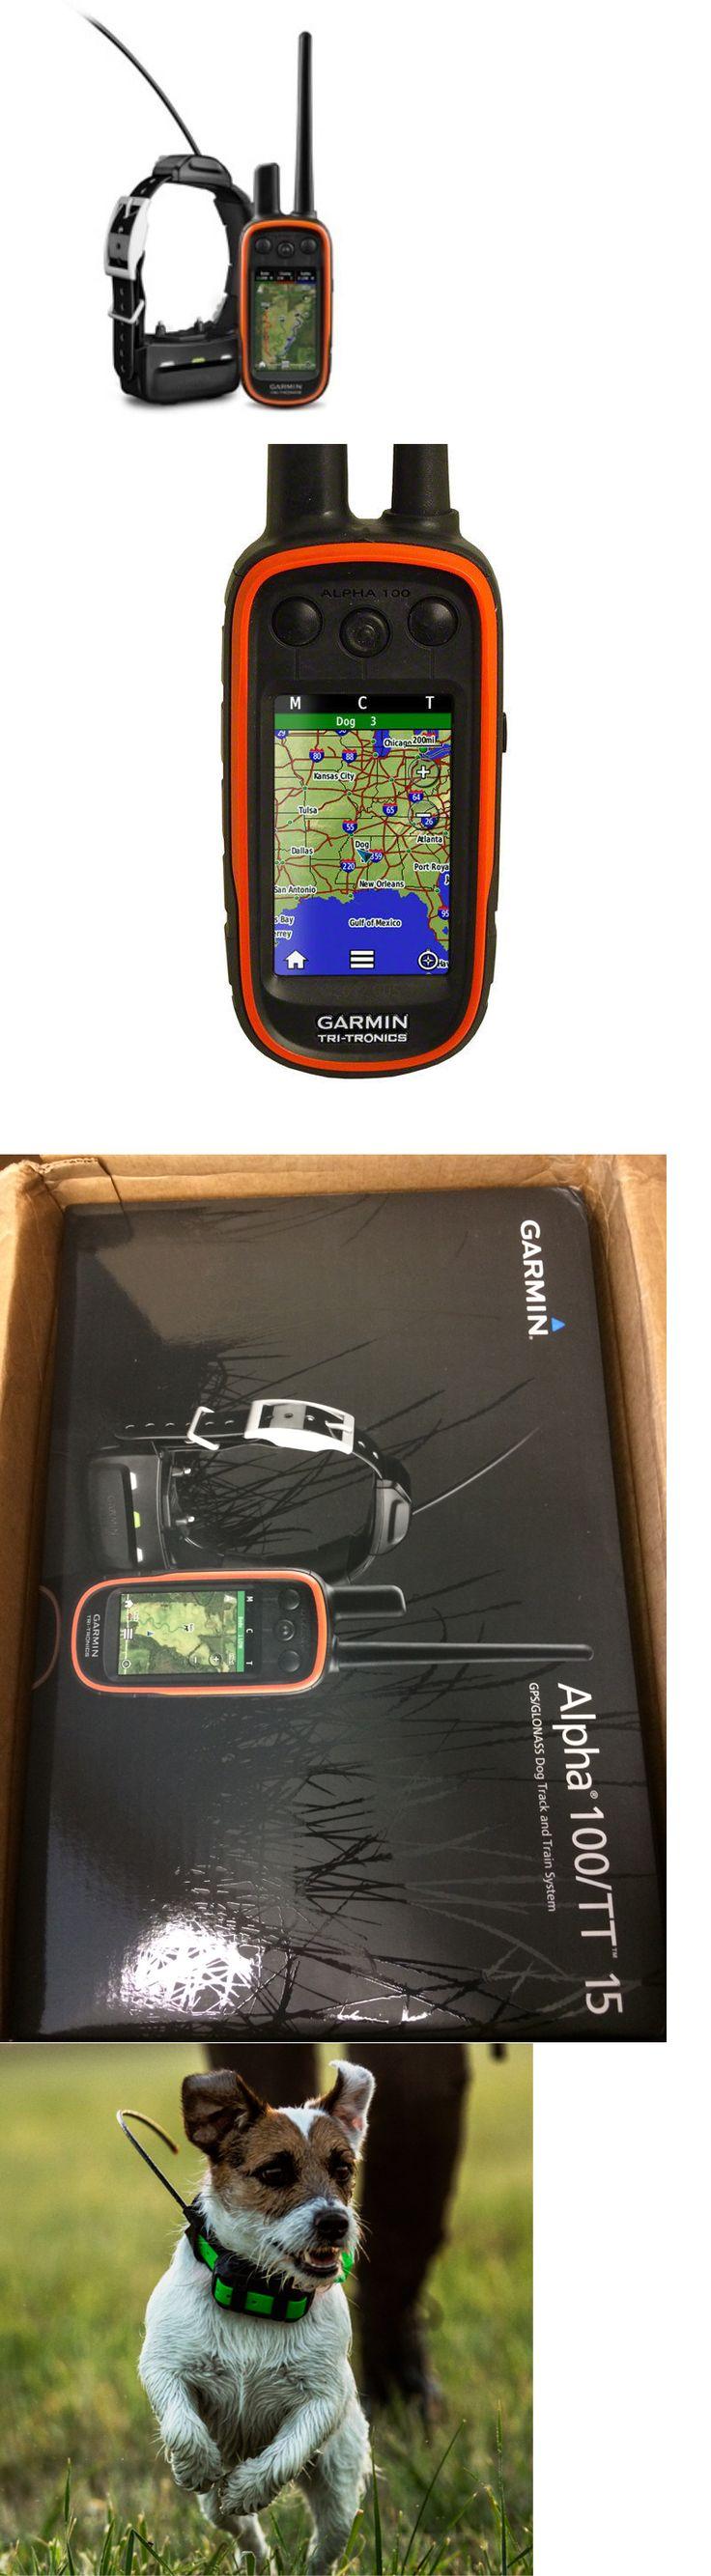 Hunting Dog Supplies 71110 Garmin Alpha 100 Combo With